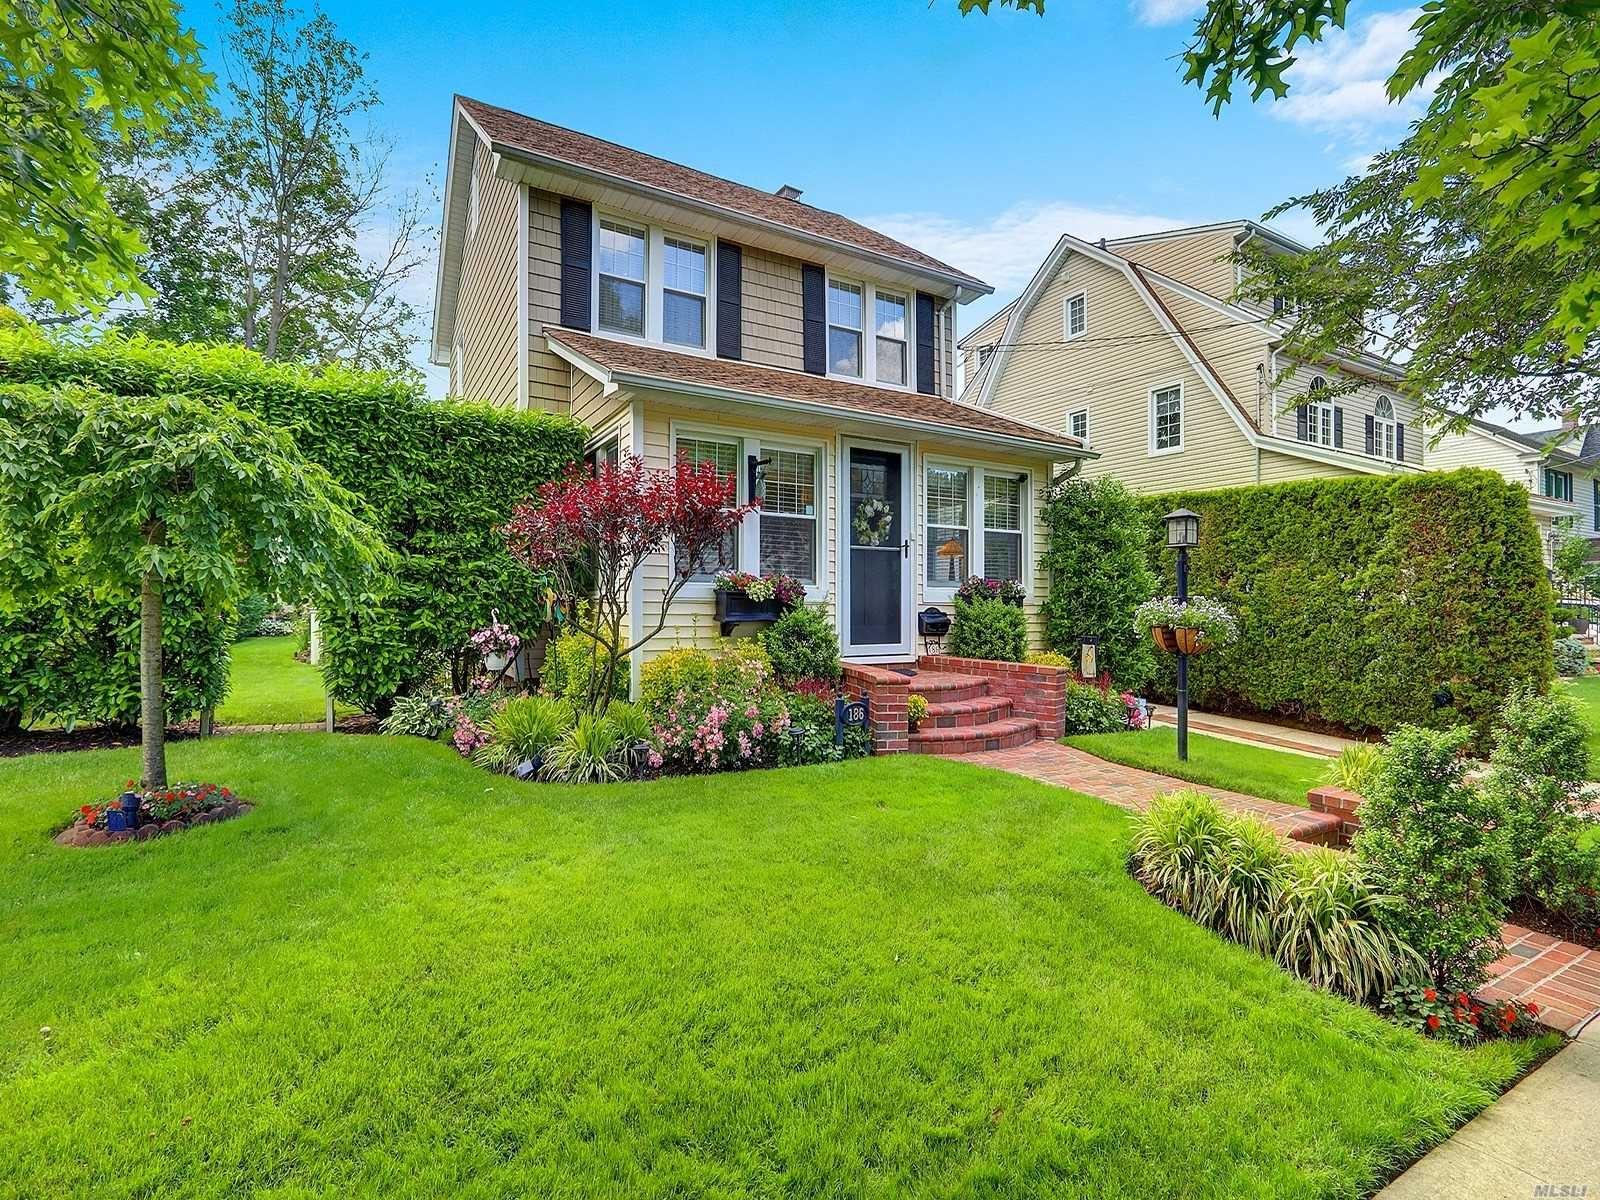 186 Verbena Avenue, Floral Park, NY 11001 - MLS#: 3223155